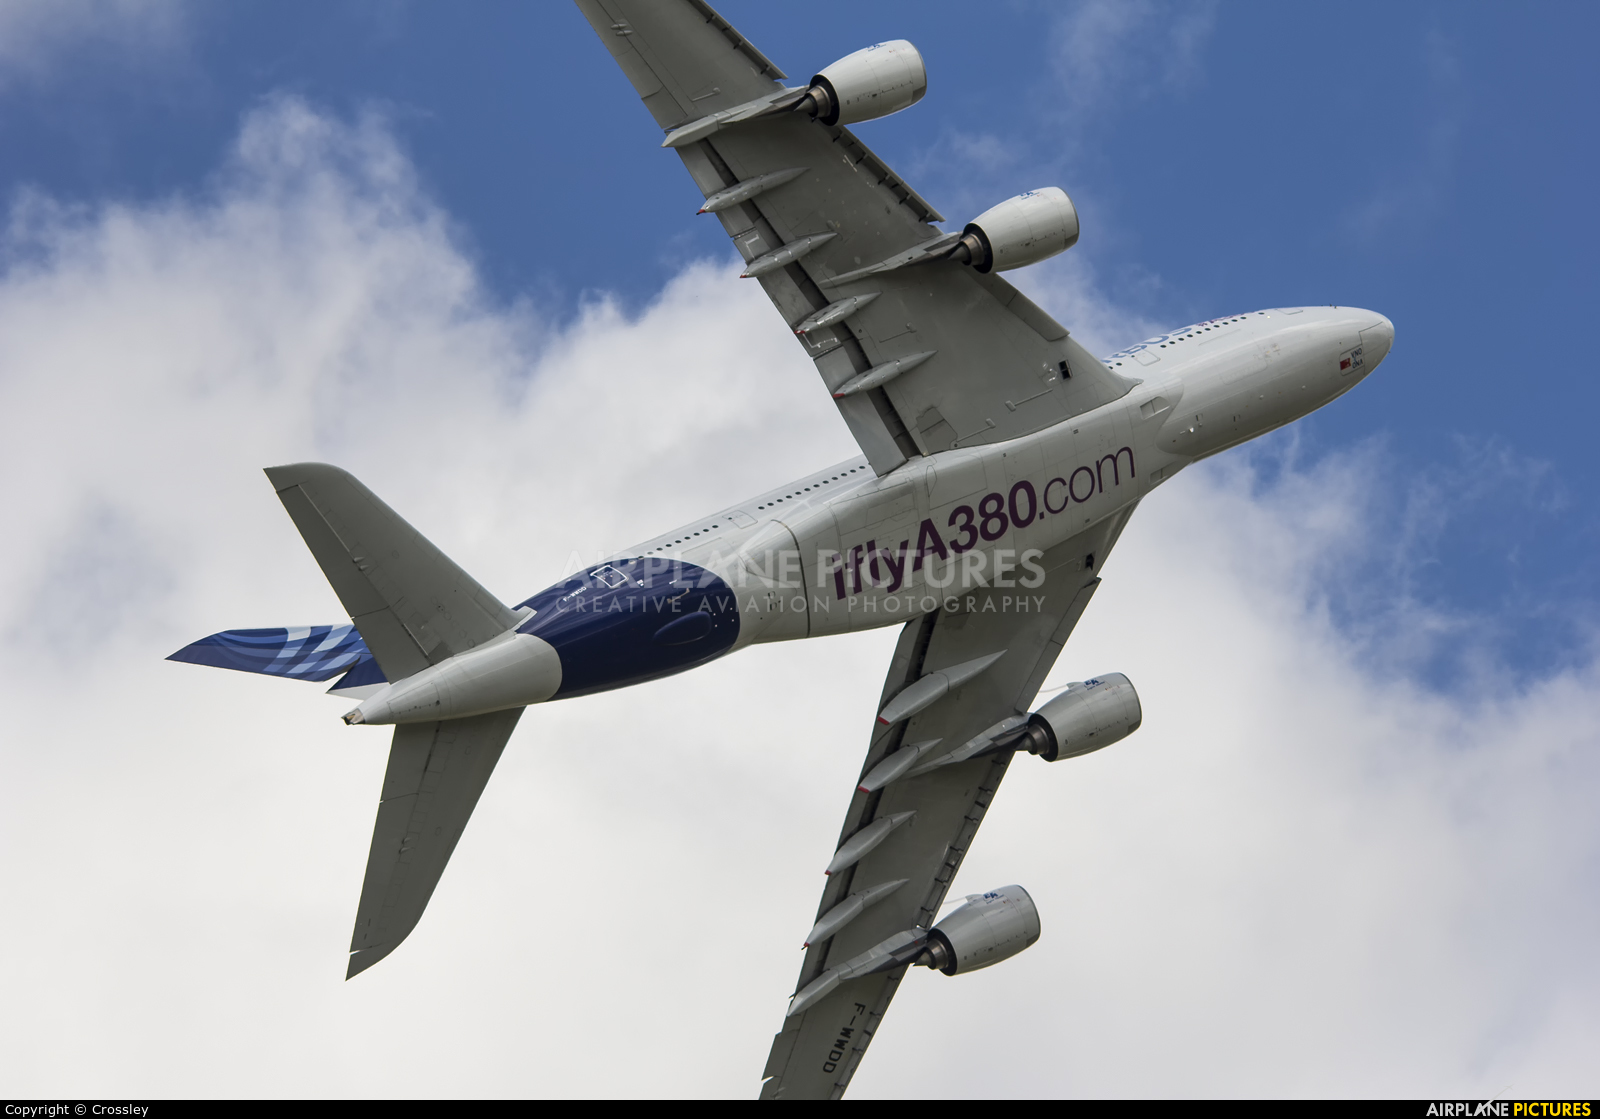 Airbus Industrie F-WWDD aircraft at Farnborough